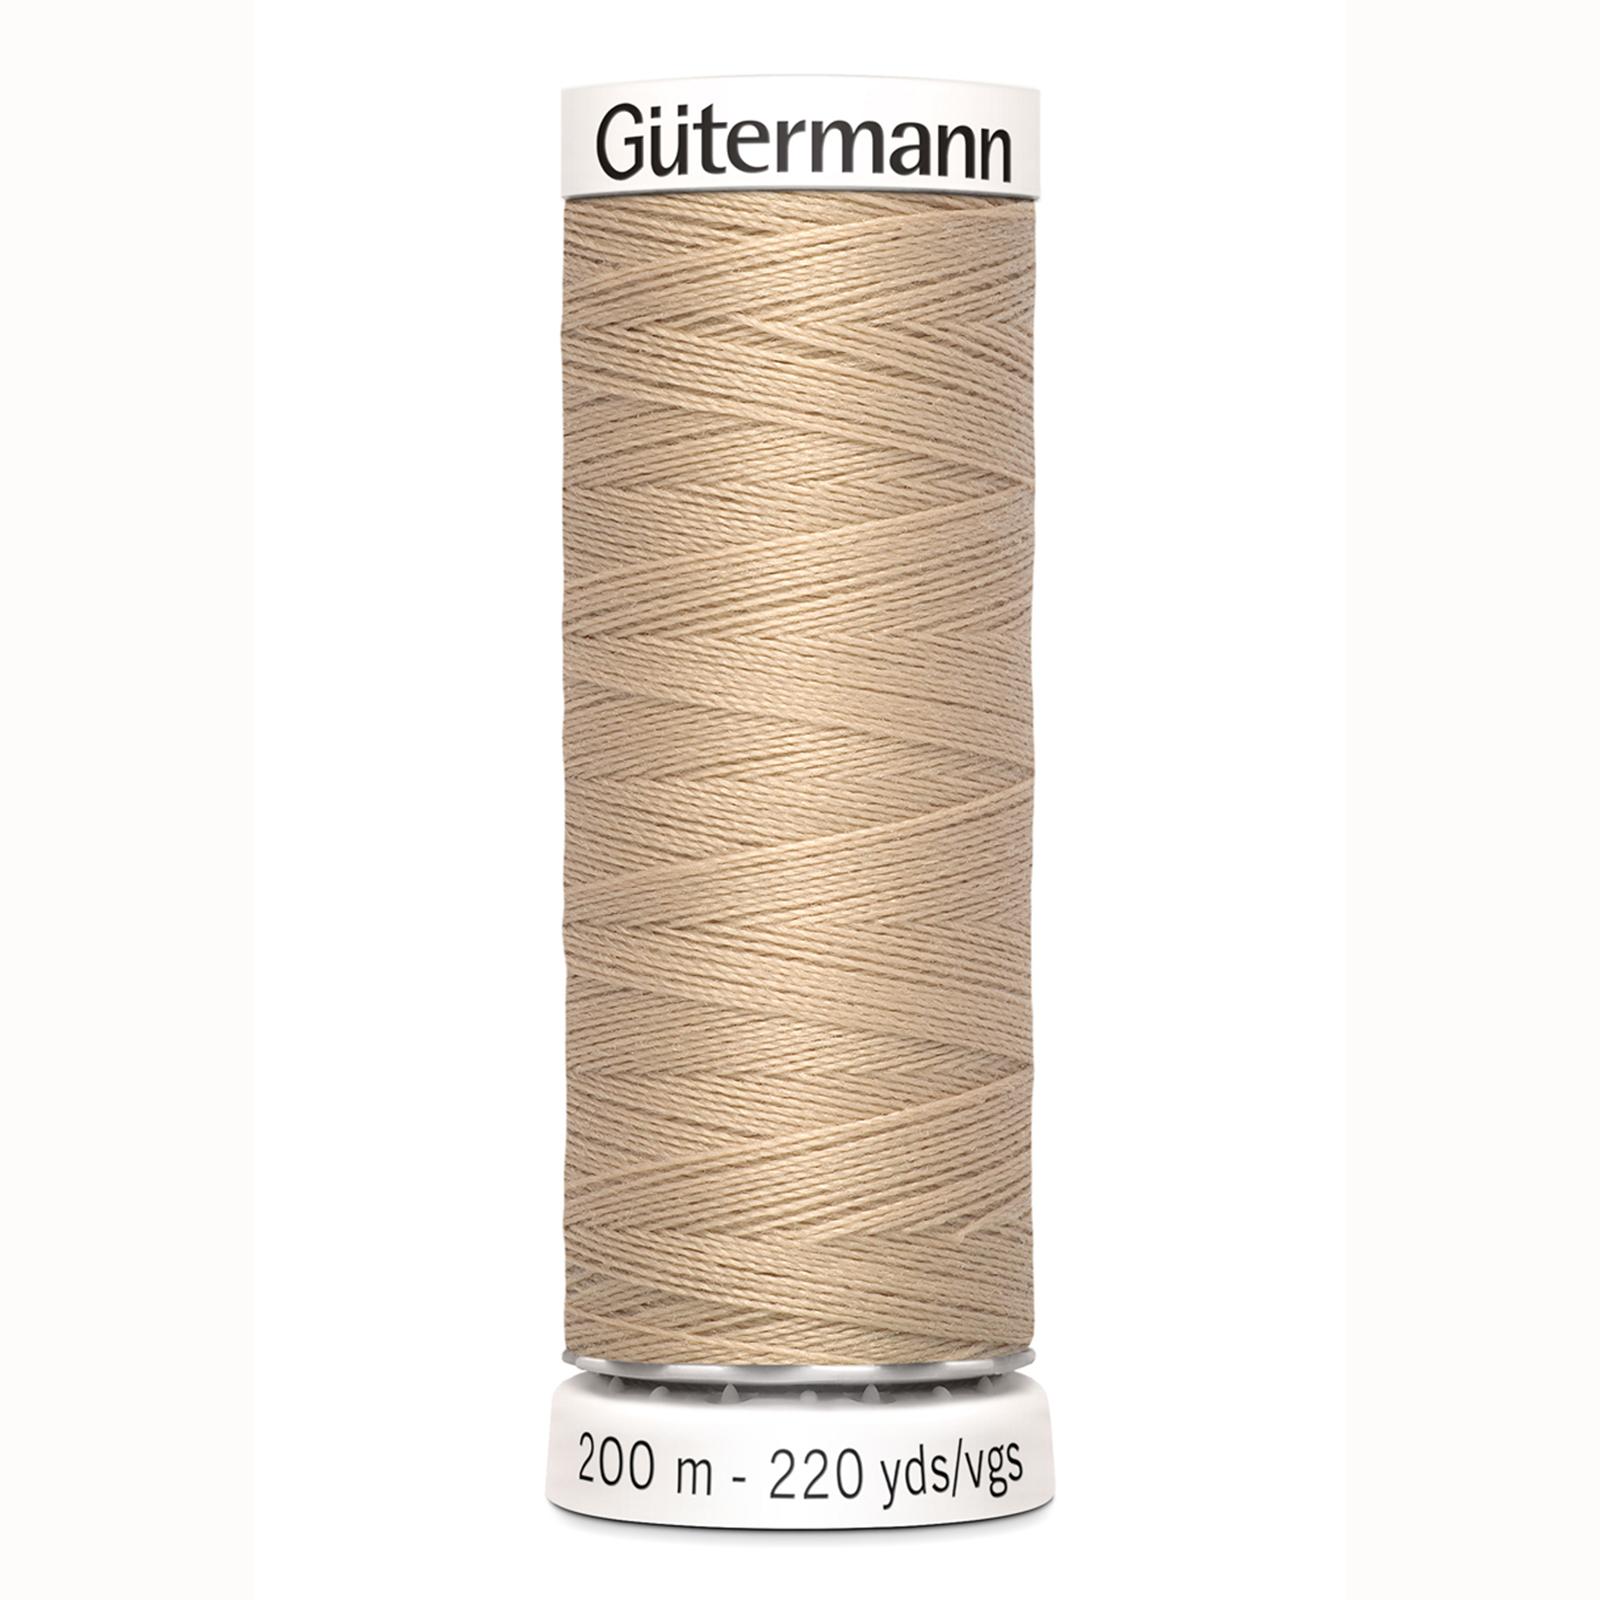 Gutermann Polyestr 200m-186